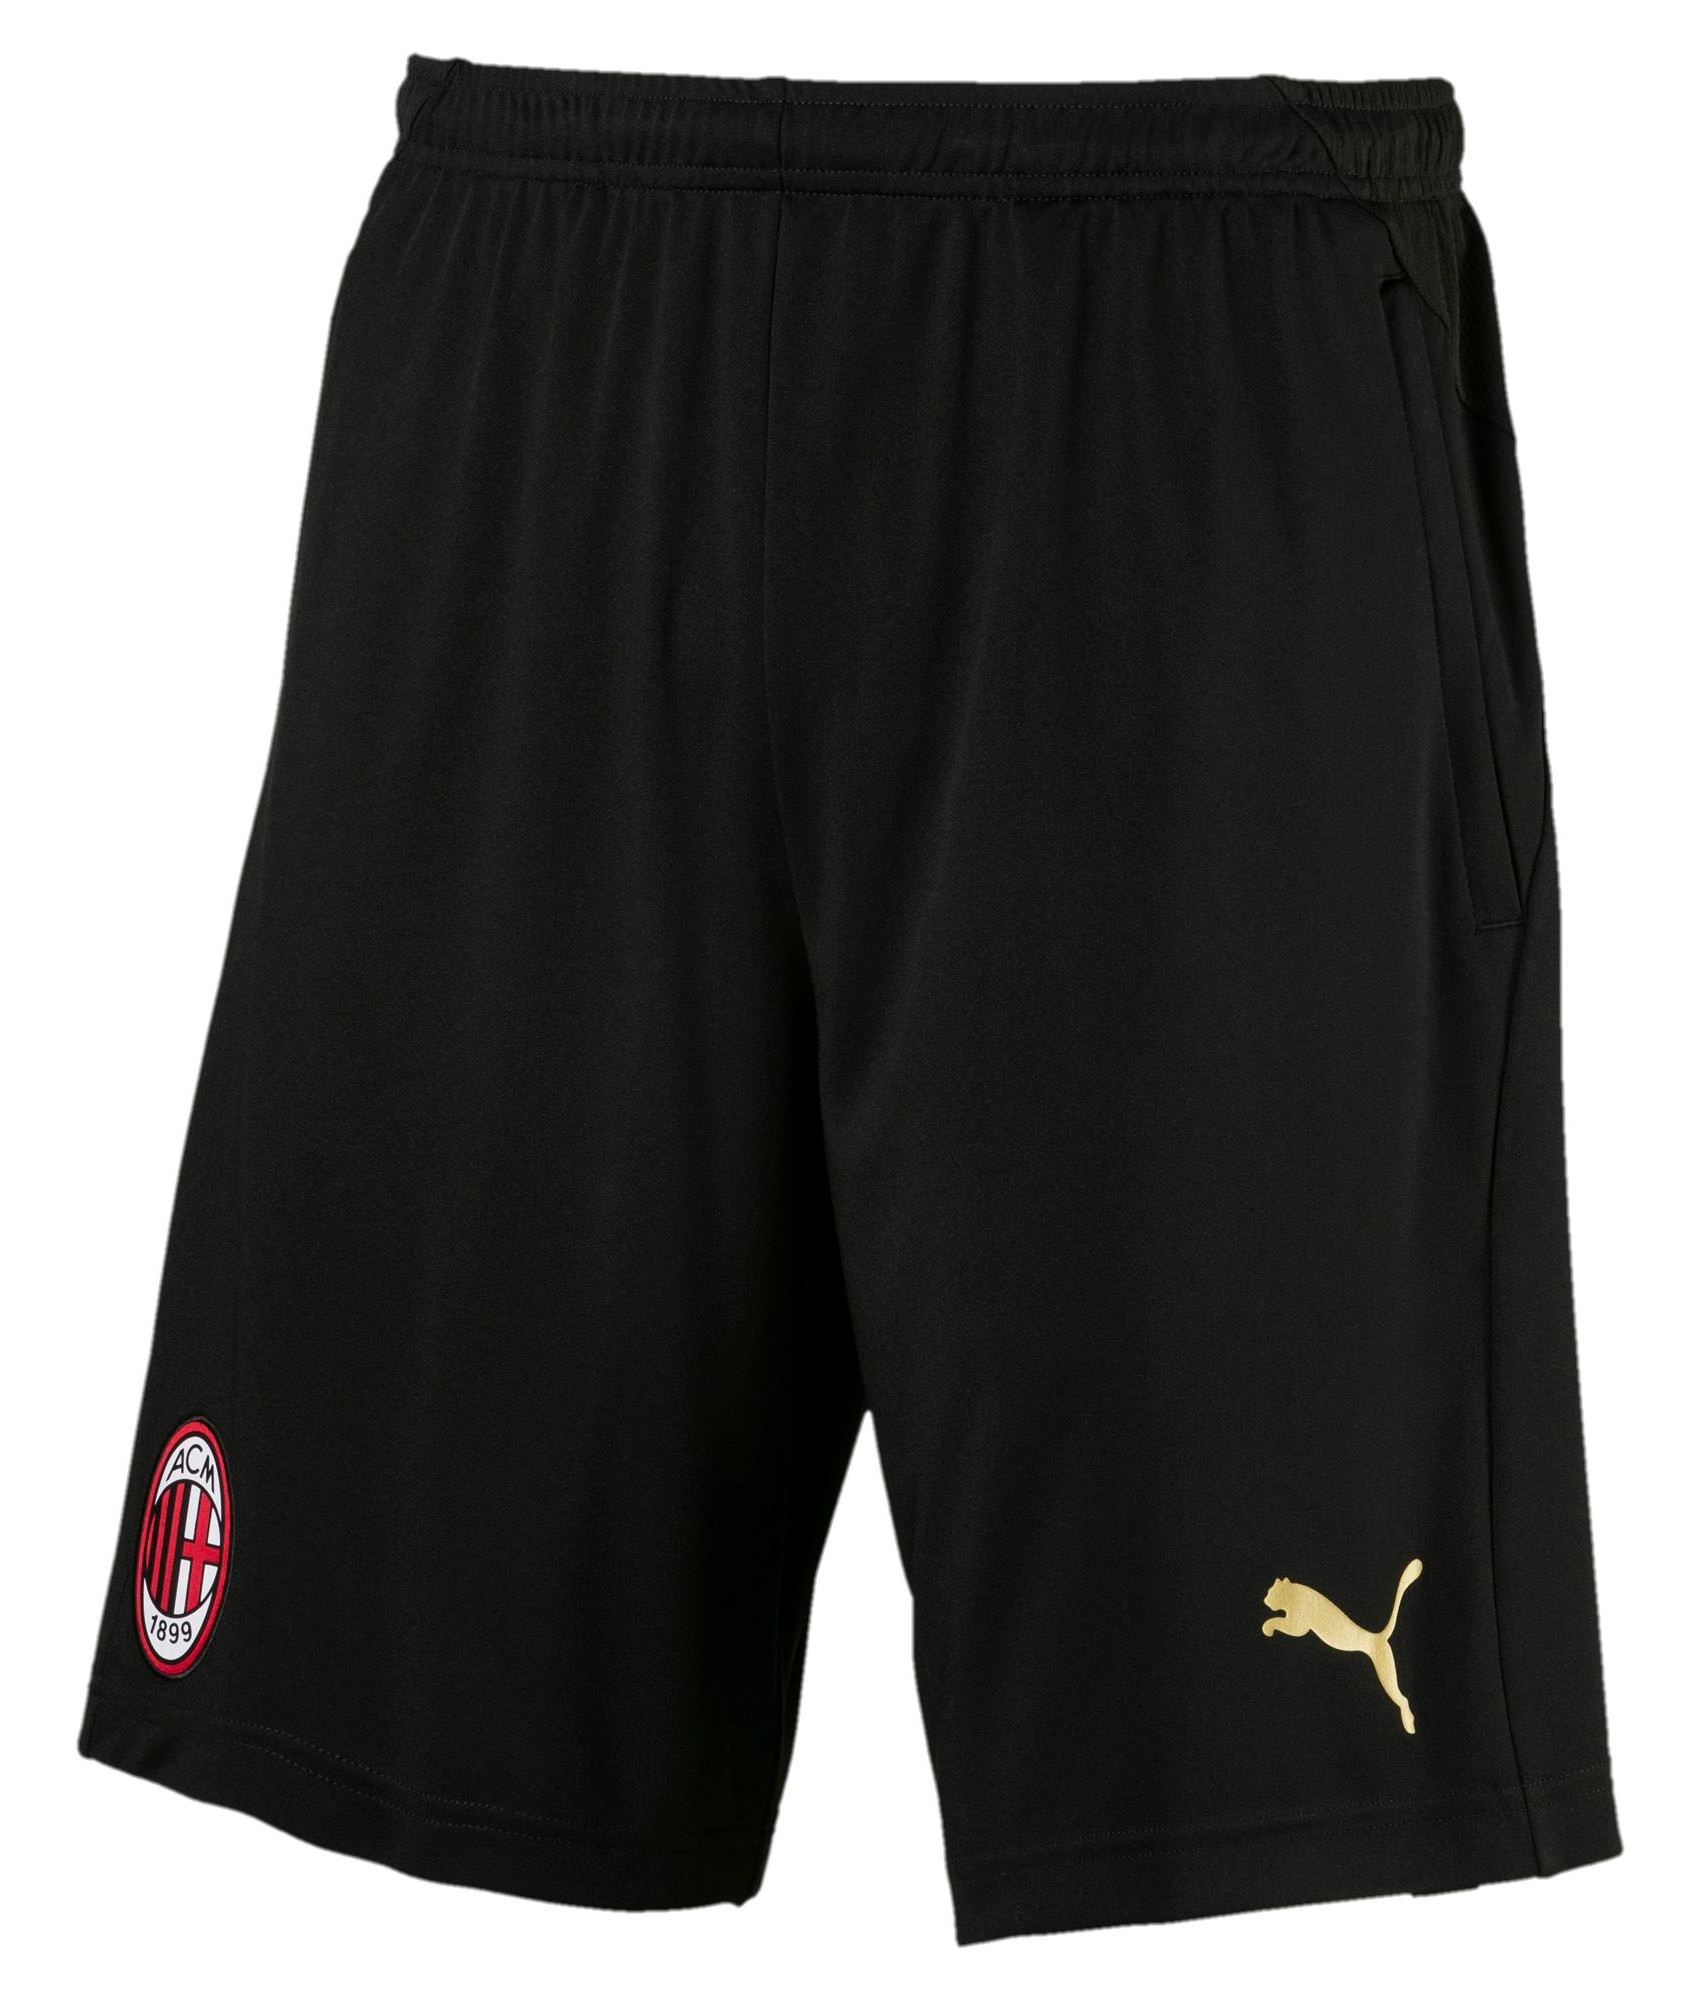 Ac Milan Puma Pantaloncini Shorts Hose Training black 2018 19